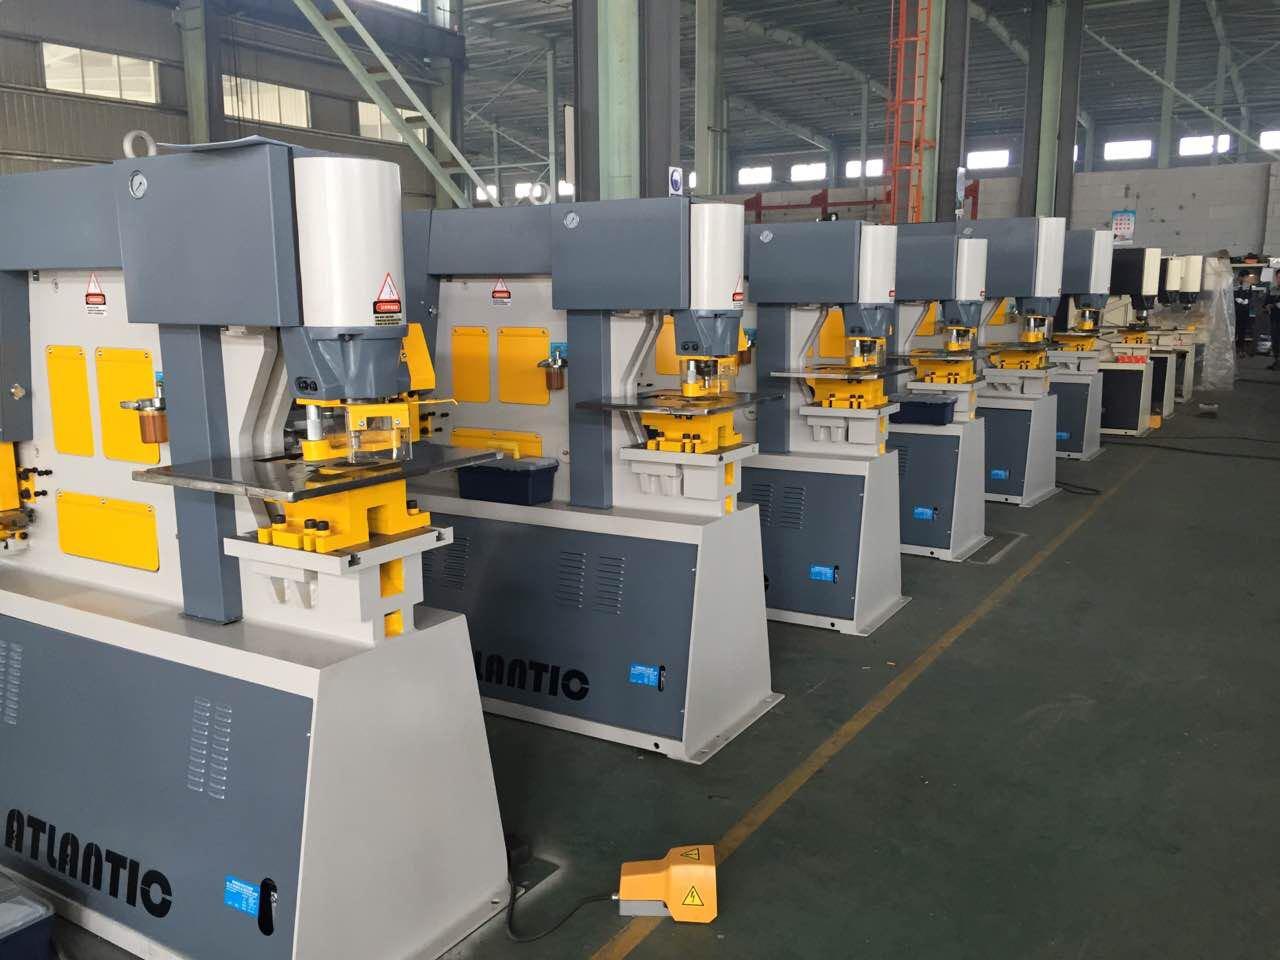 Kingsland Atlantic Multi 125 Iron Worker For Sale In Australia 3